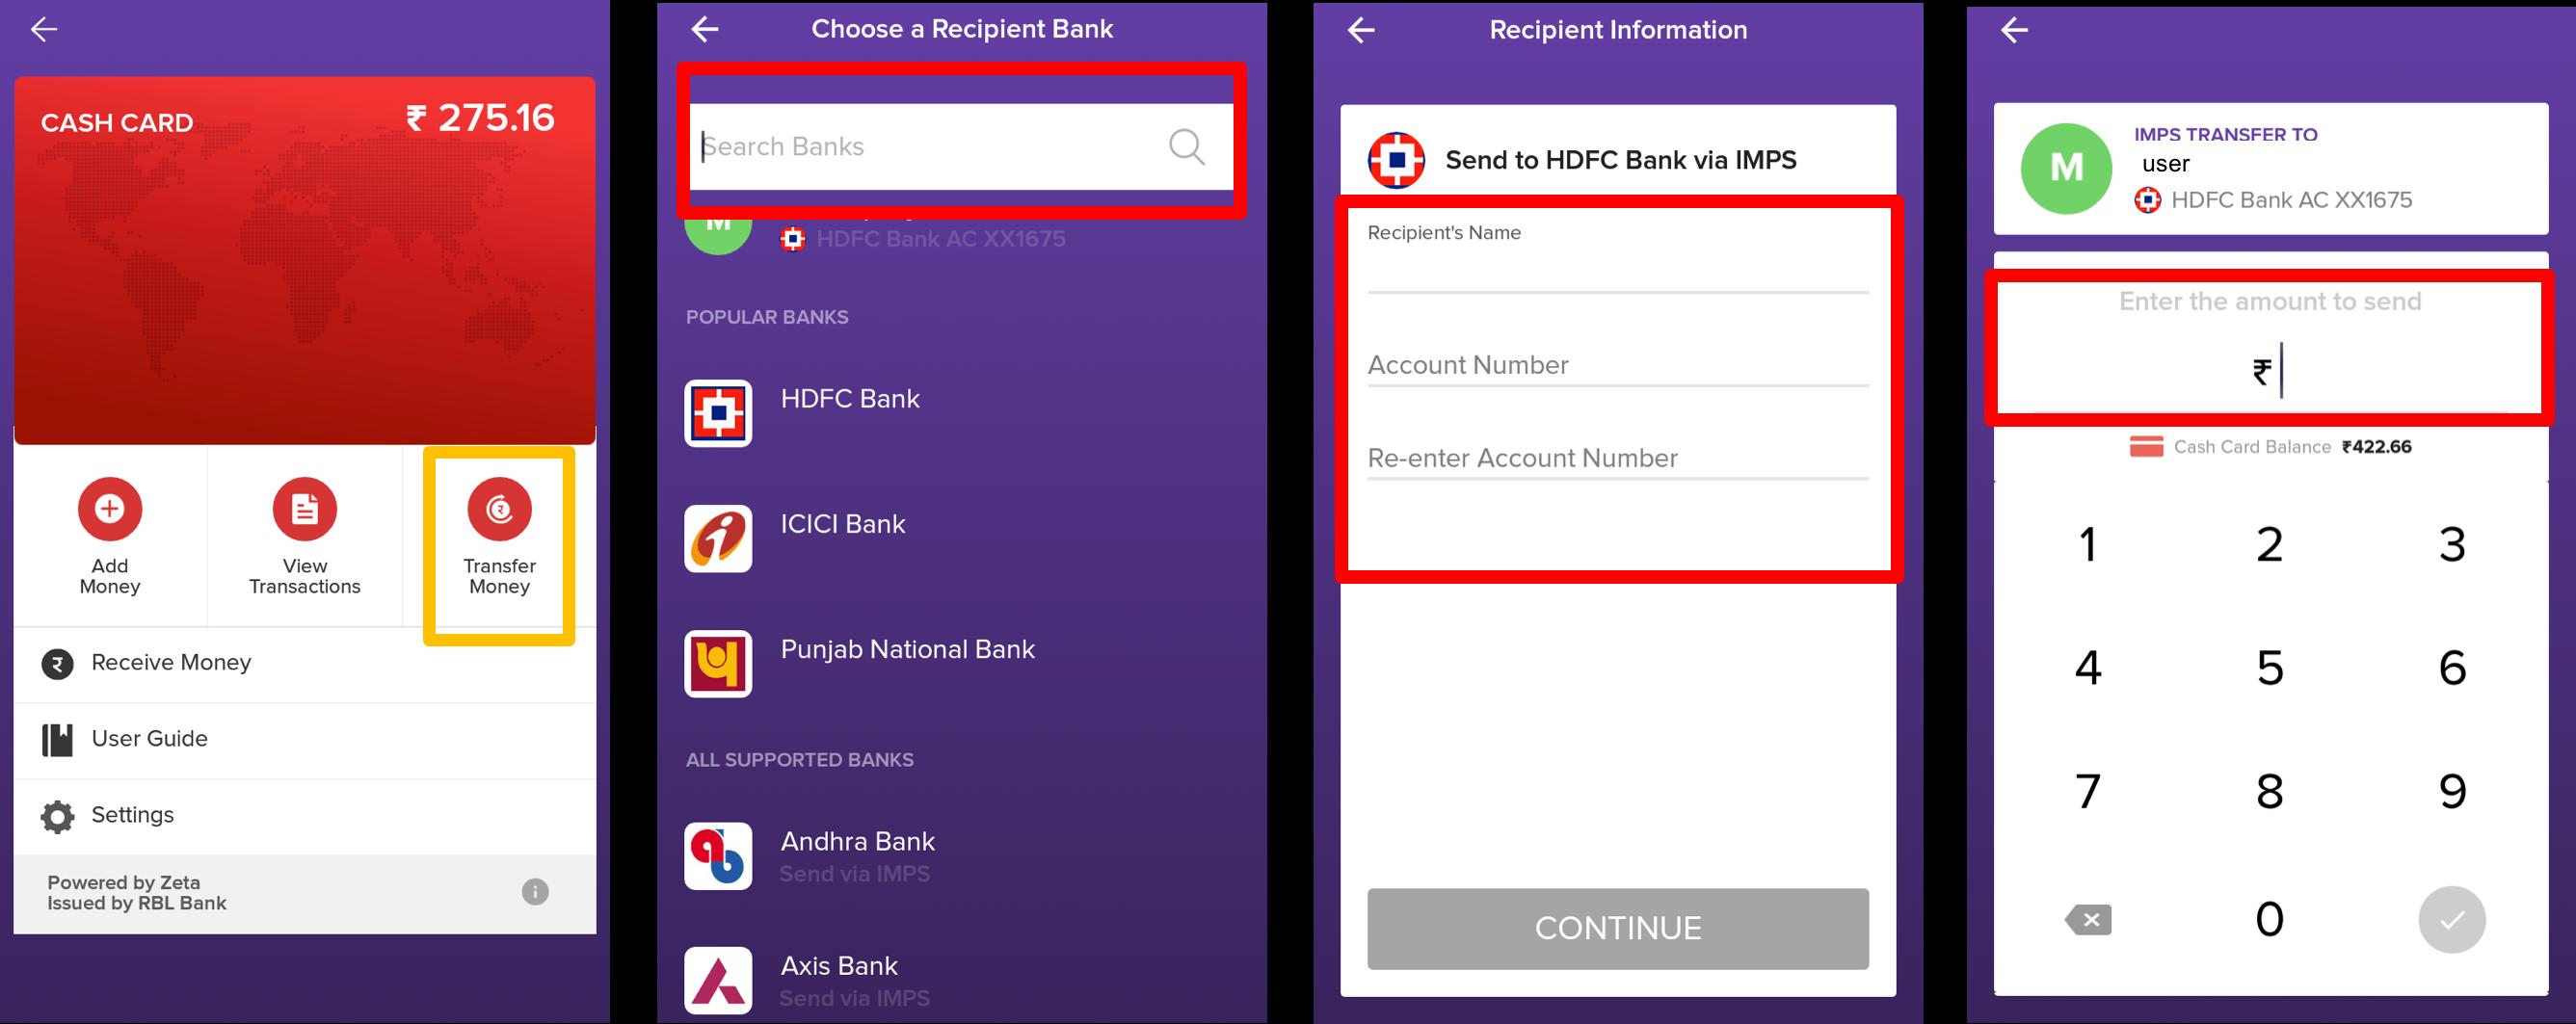 Manage Cash Card - Help Center - Learn Zeta Digital Payment